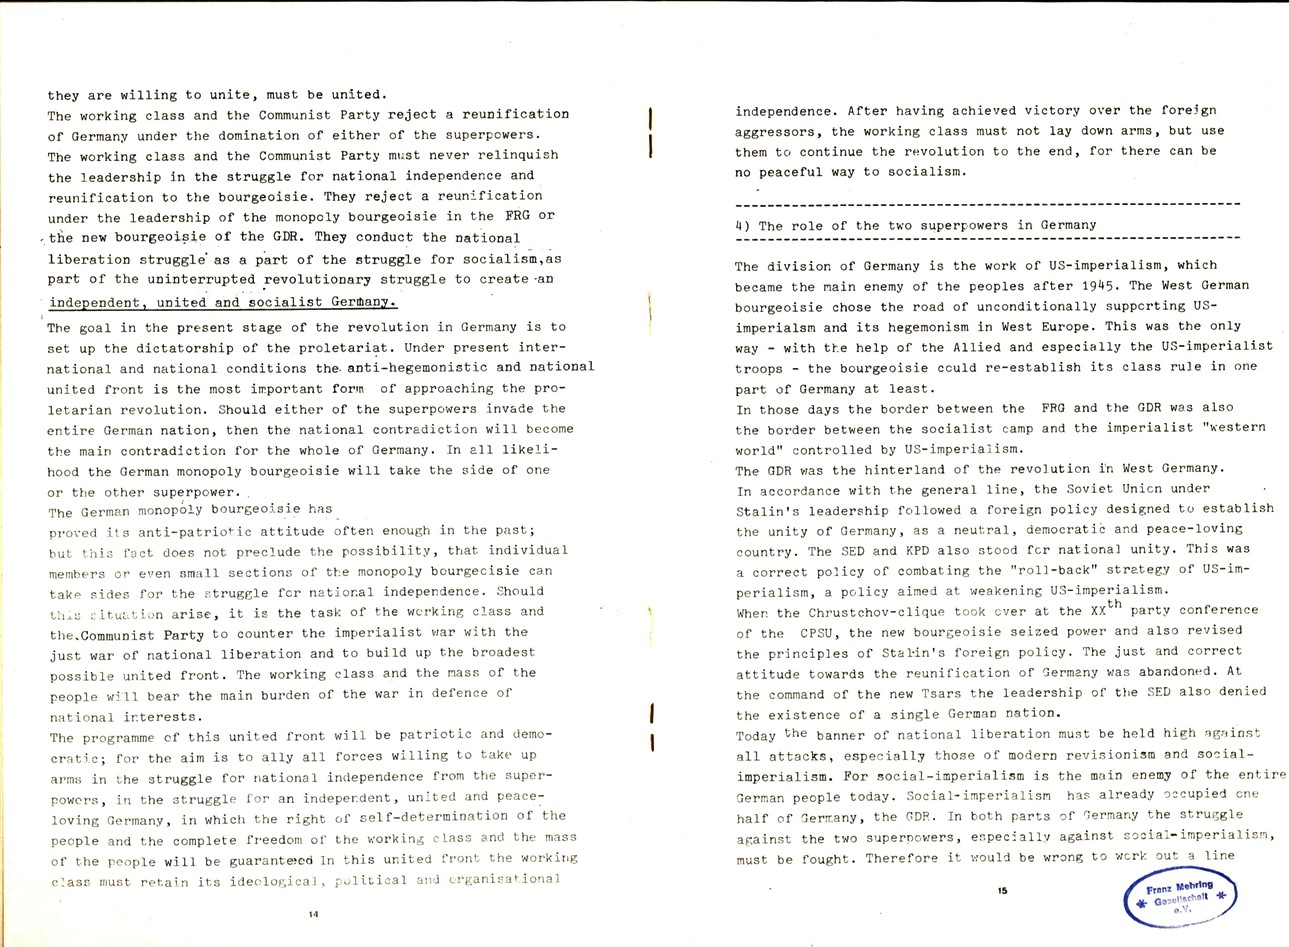 KPDAO_1976_Declaration_09